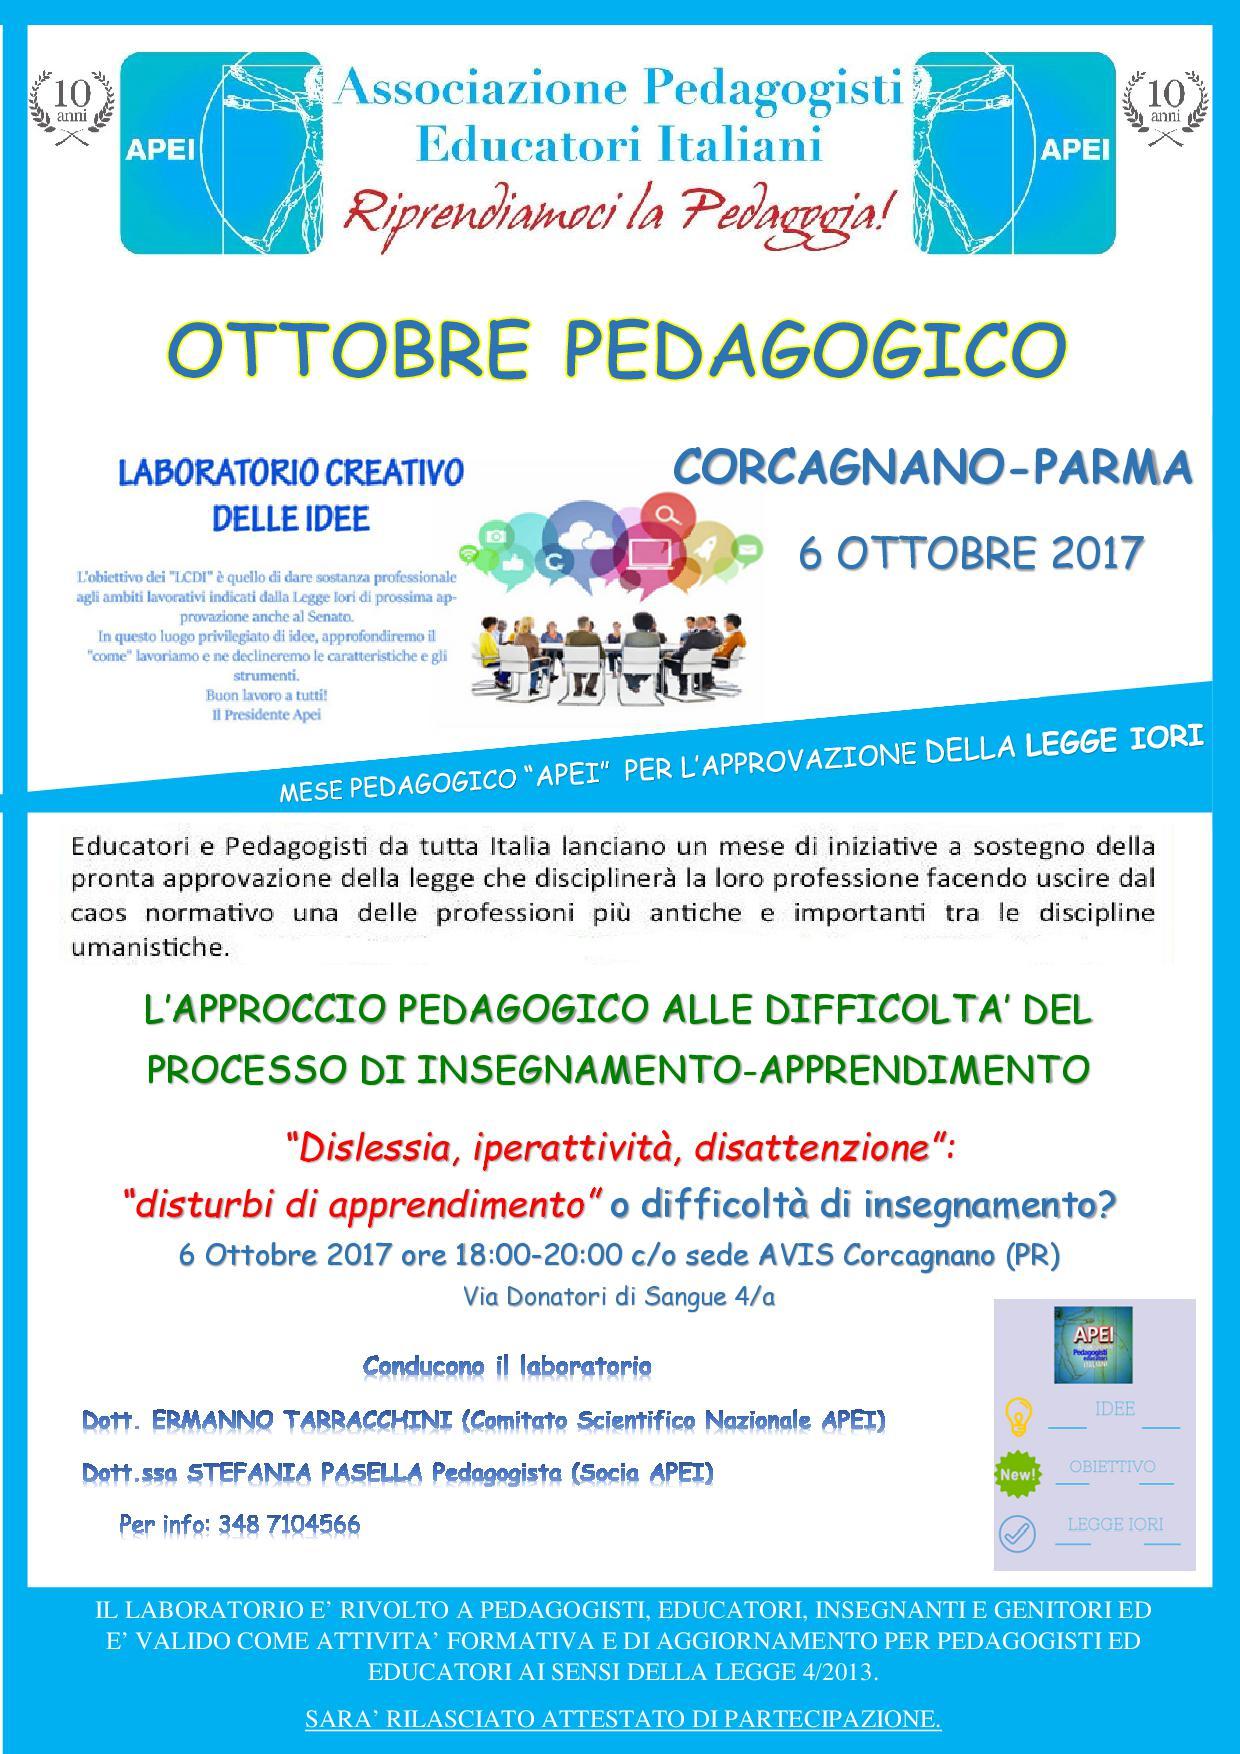 LOCANDINA-OTT-PED-PARMA2 .jpg